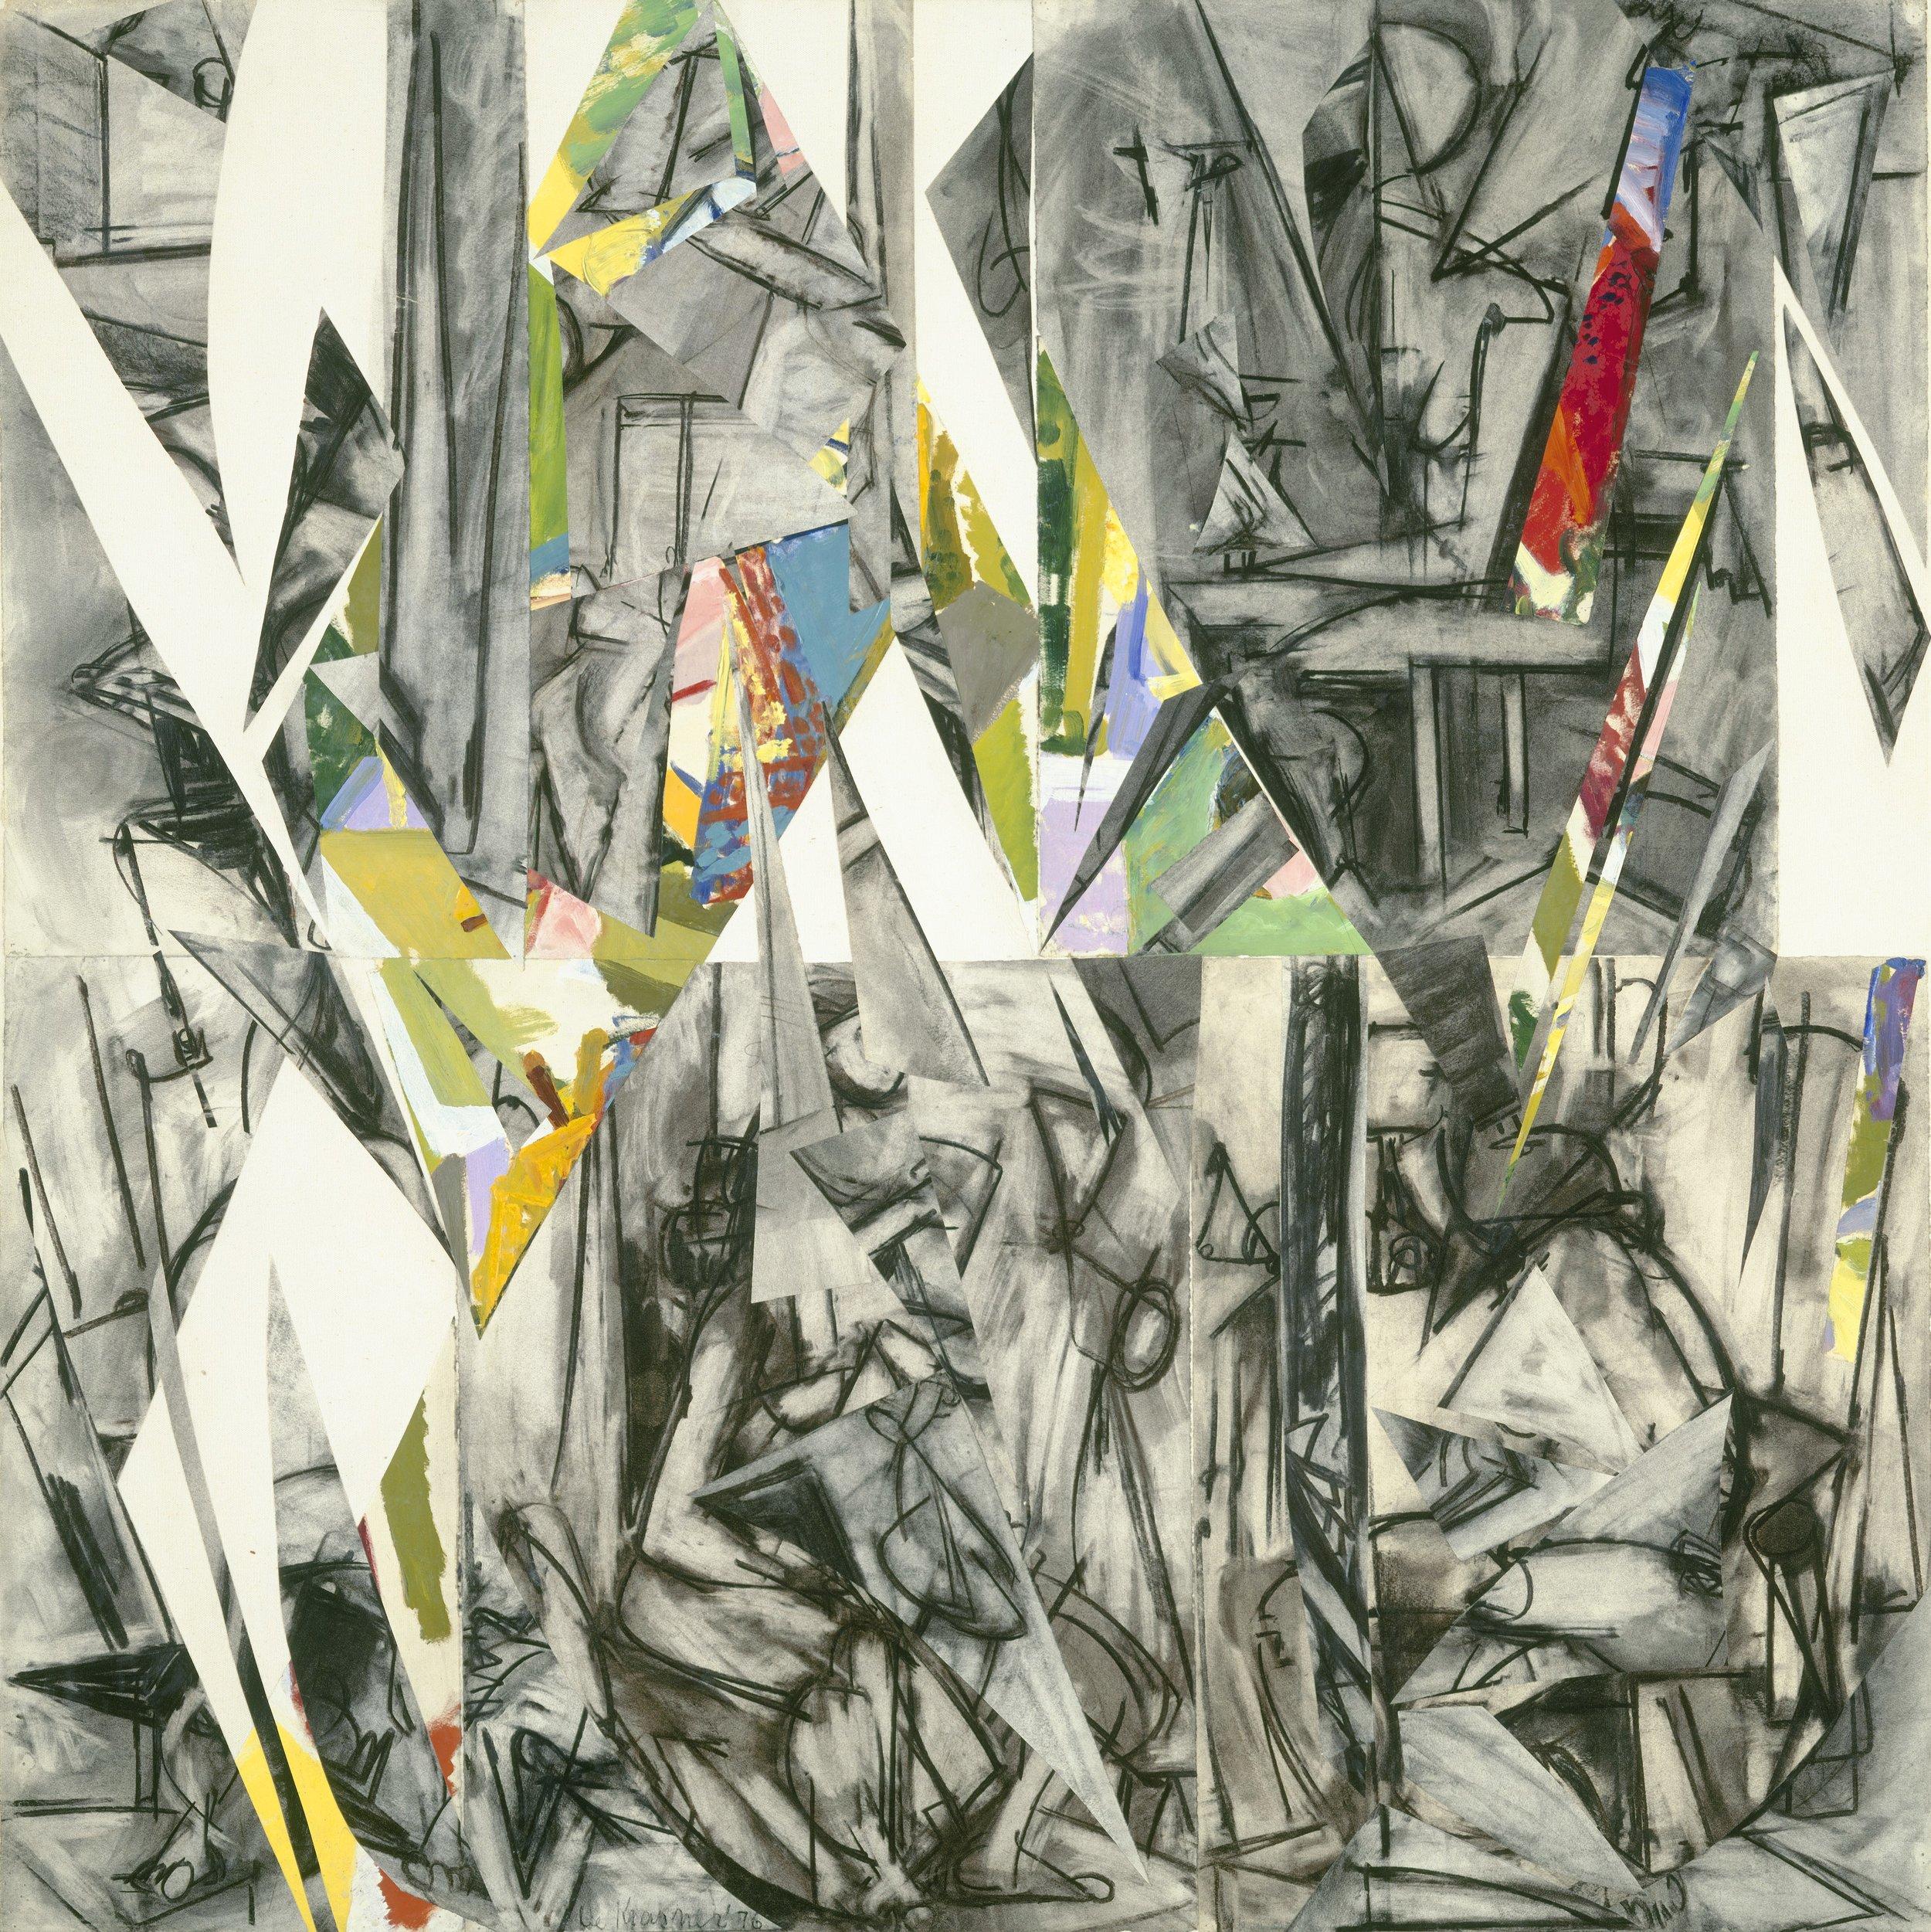 Lee Krasner, Imperative, 1976, National Gallery of Art, Washington D.C. © The Pollock-Krasner Foundation. Courtesy National Gallery of Art, Washington D.C.